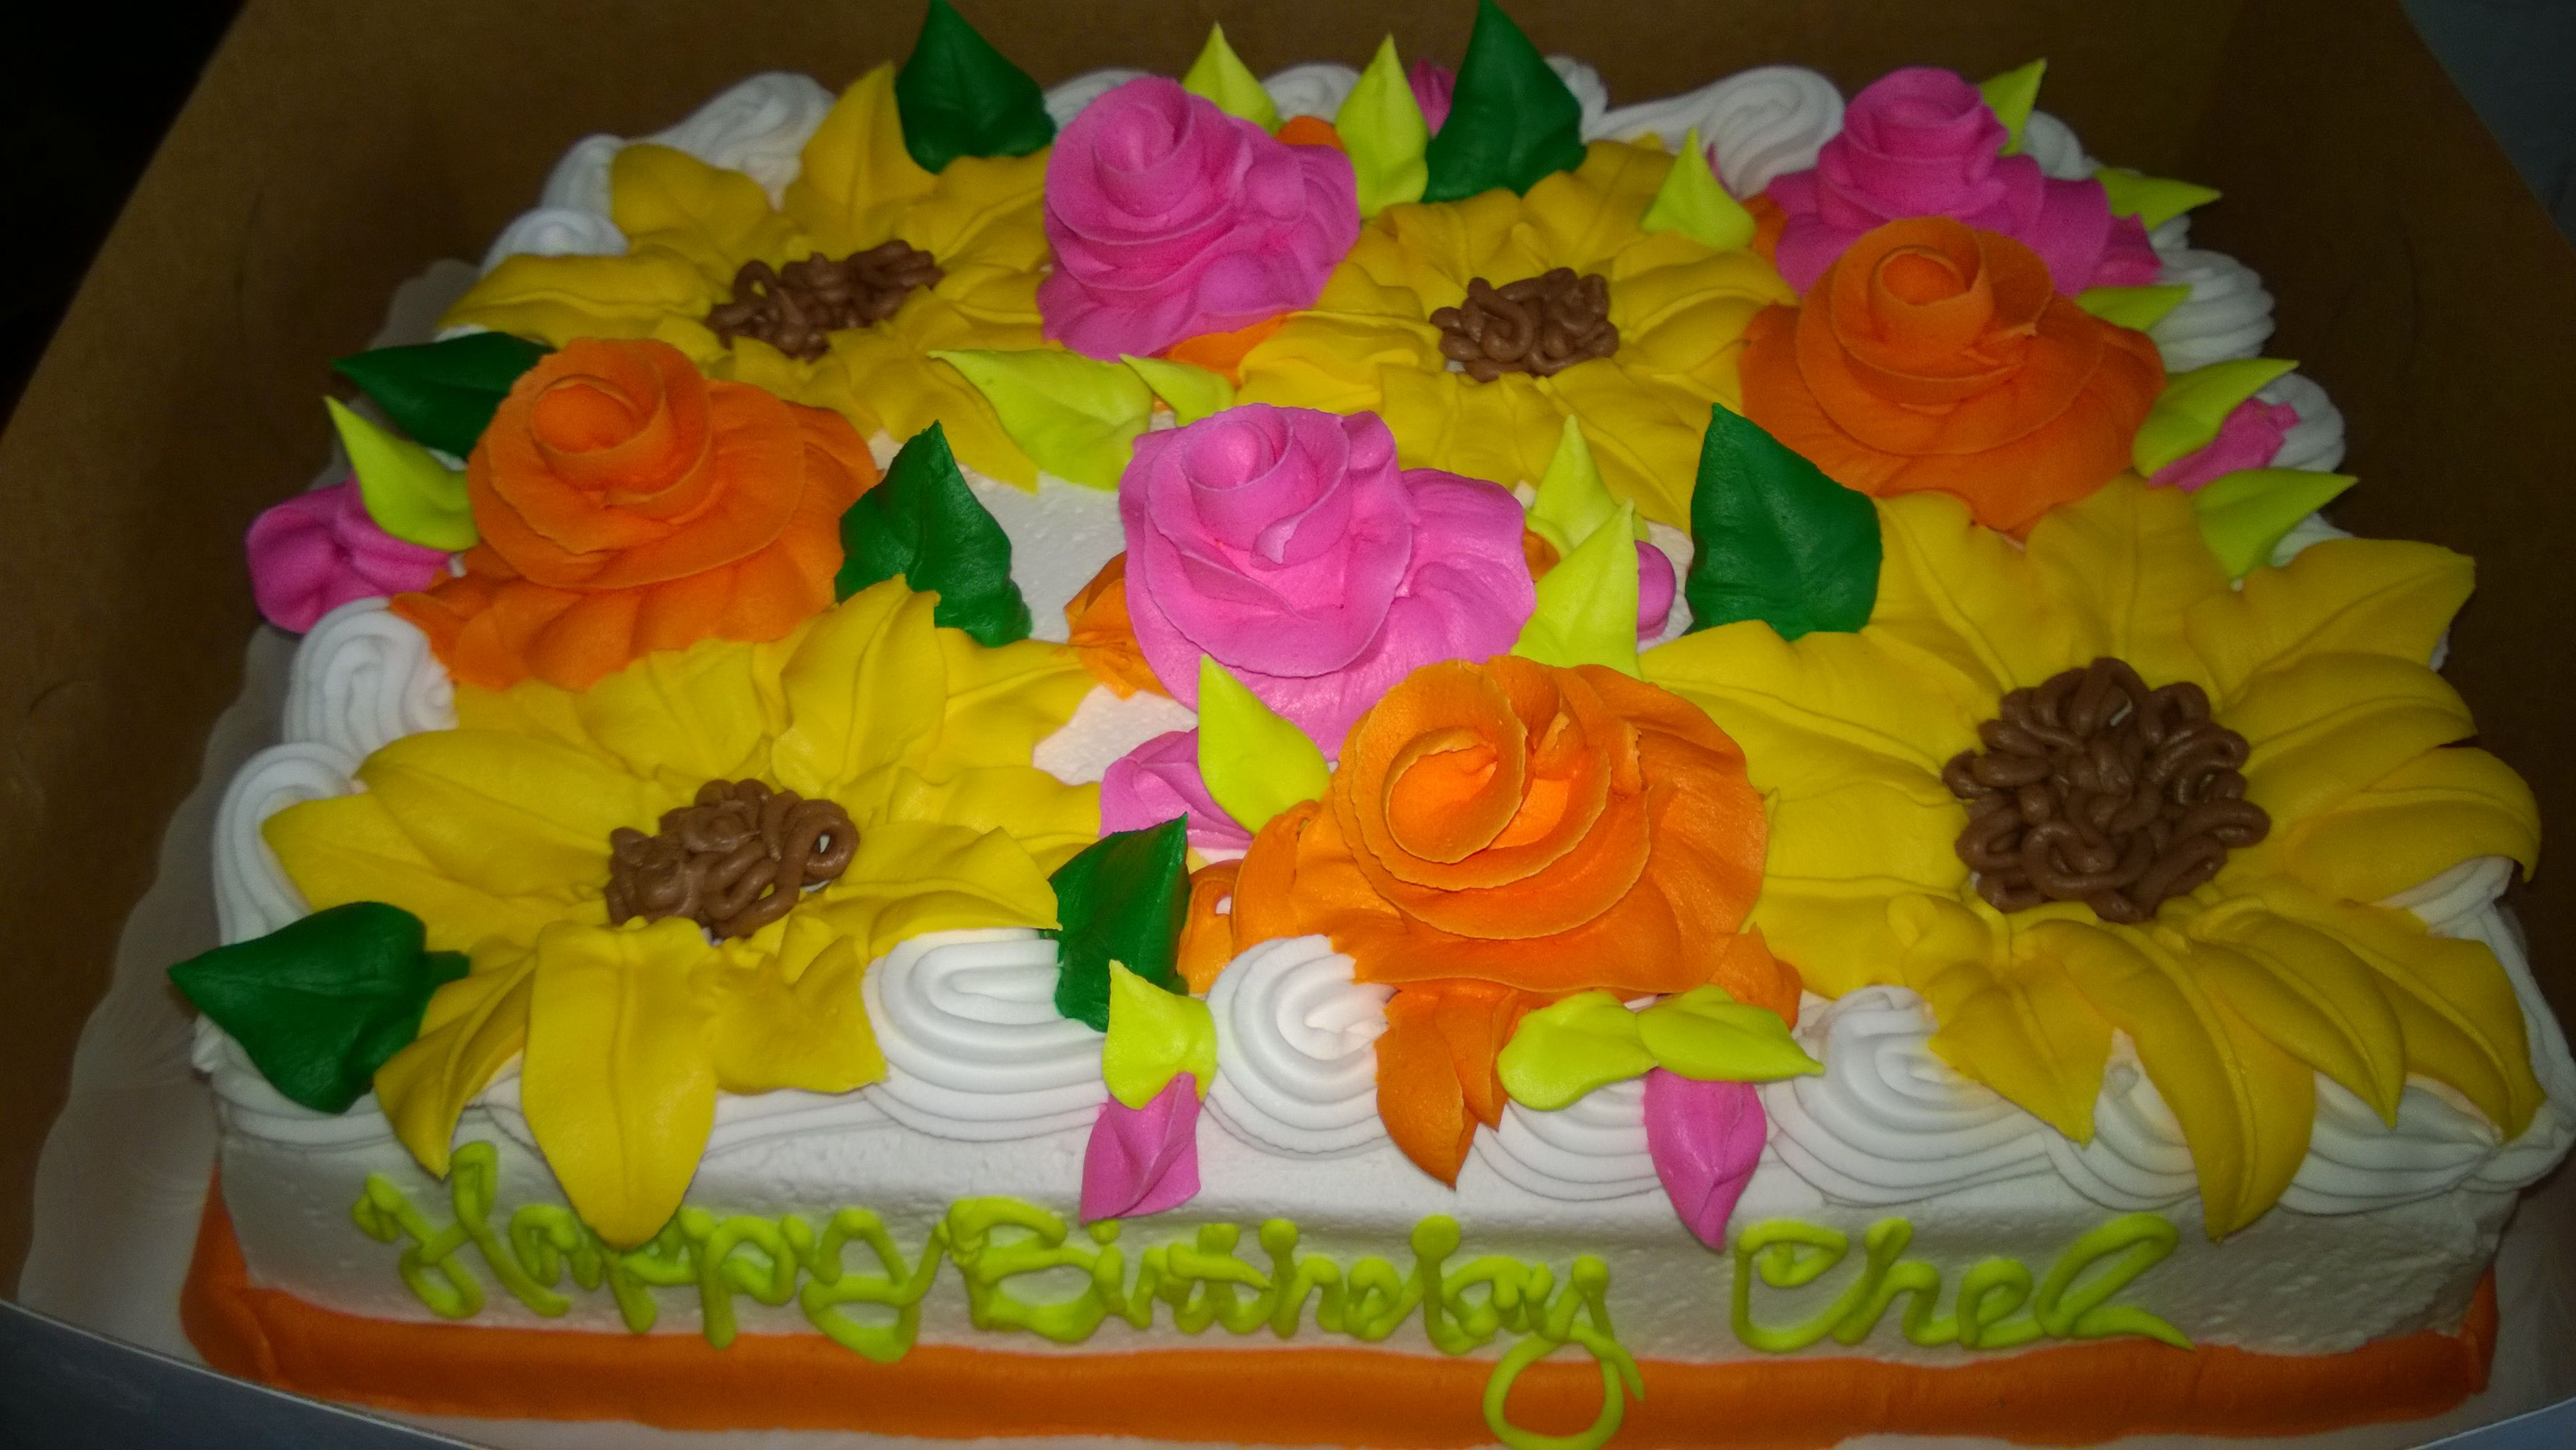 The Best Birthday Cake Ever Jacksons Bakery Chattanooga Tn